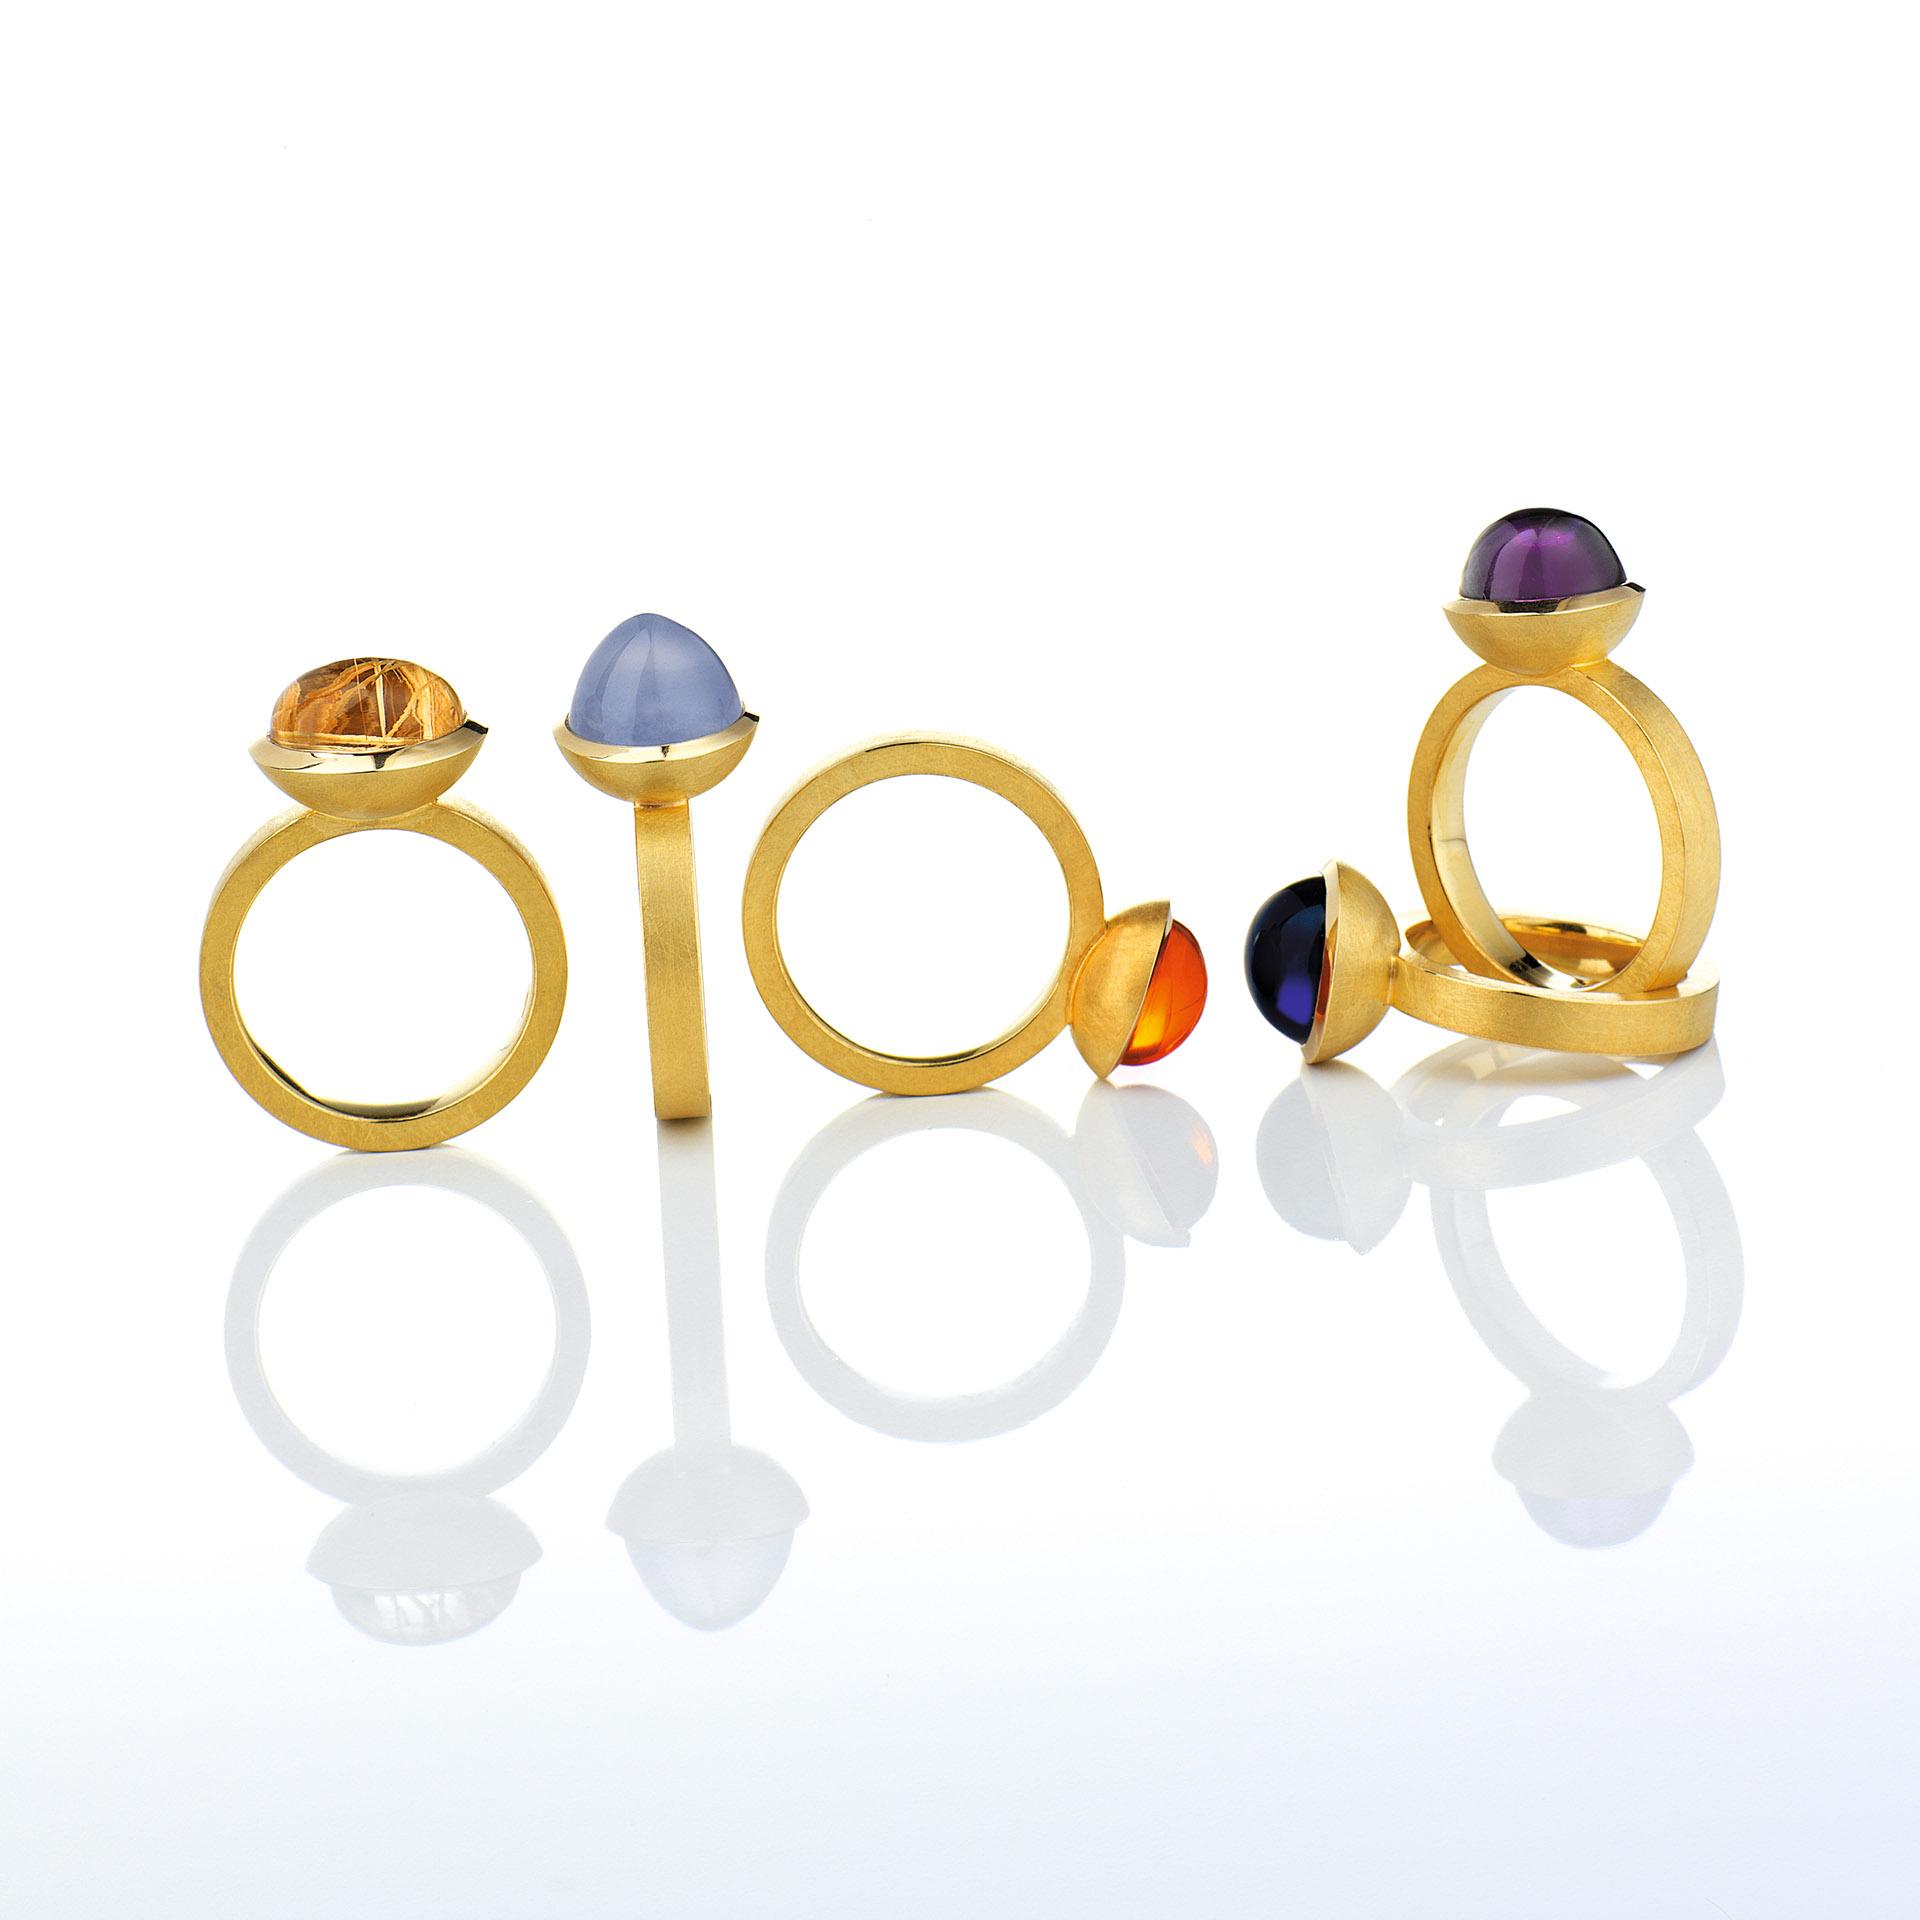 Produktfotografie Werbefotografie Fotograf Oberfranken Handgeschmiedete Goldringe mit Edelsteinen Juwelier Brunat. Feigfotodesign